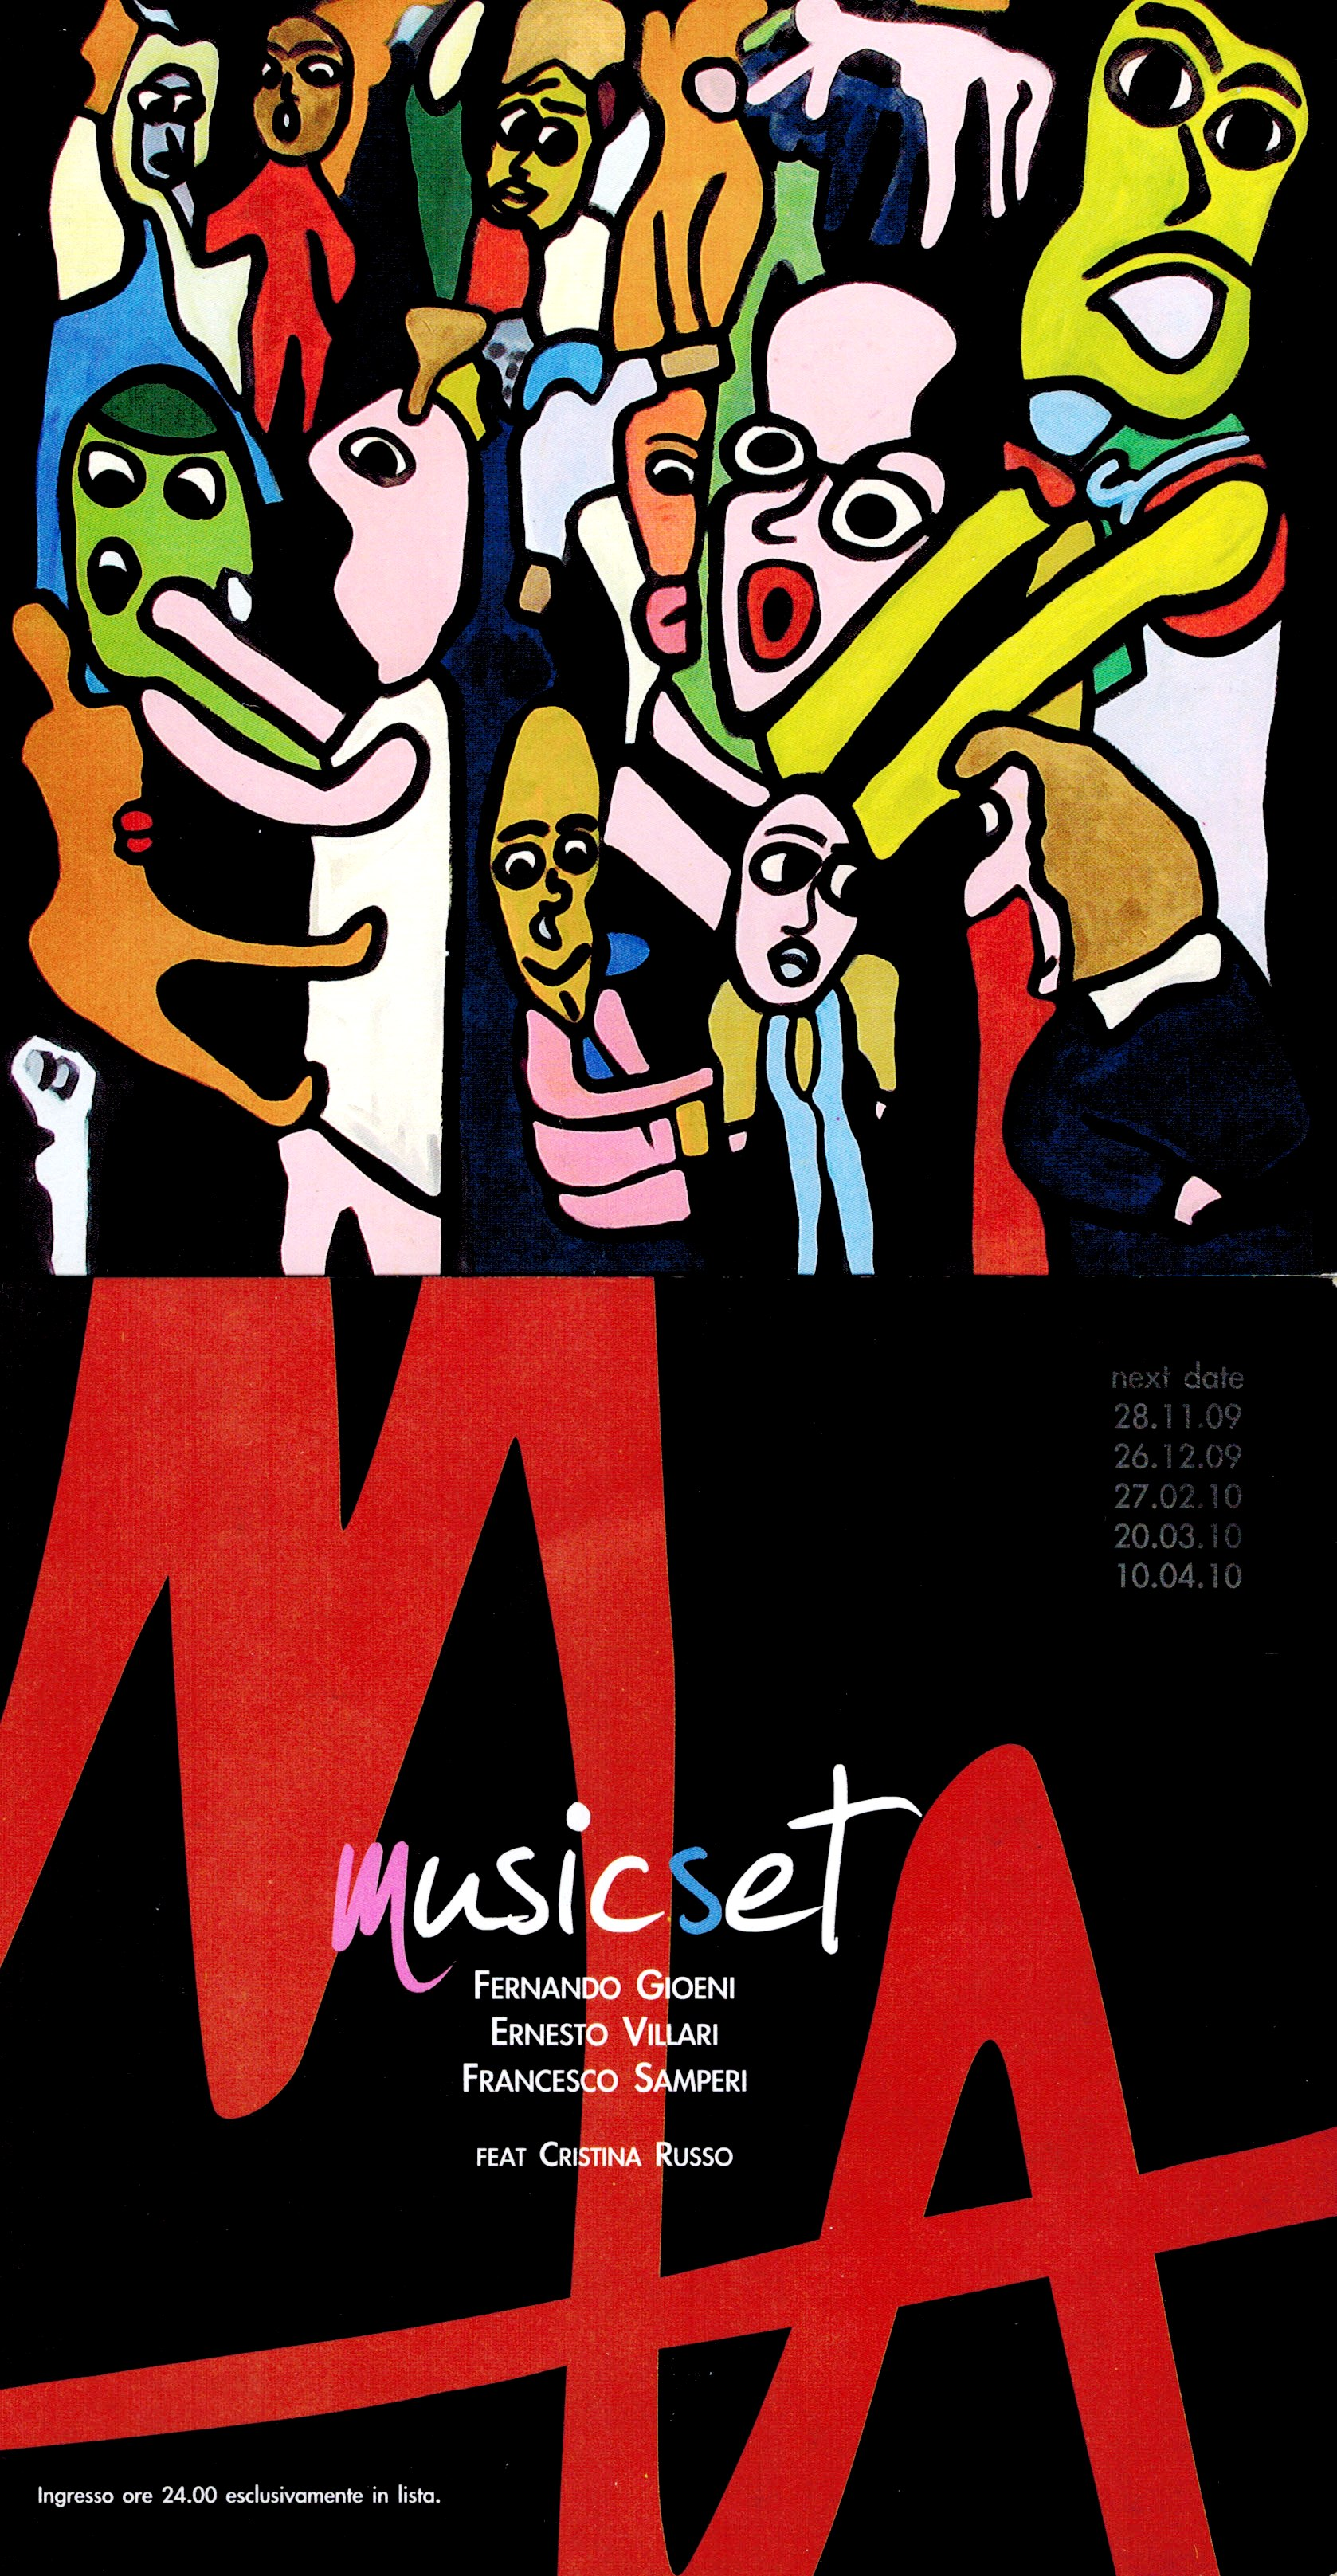 musicset